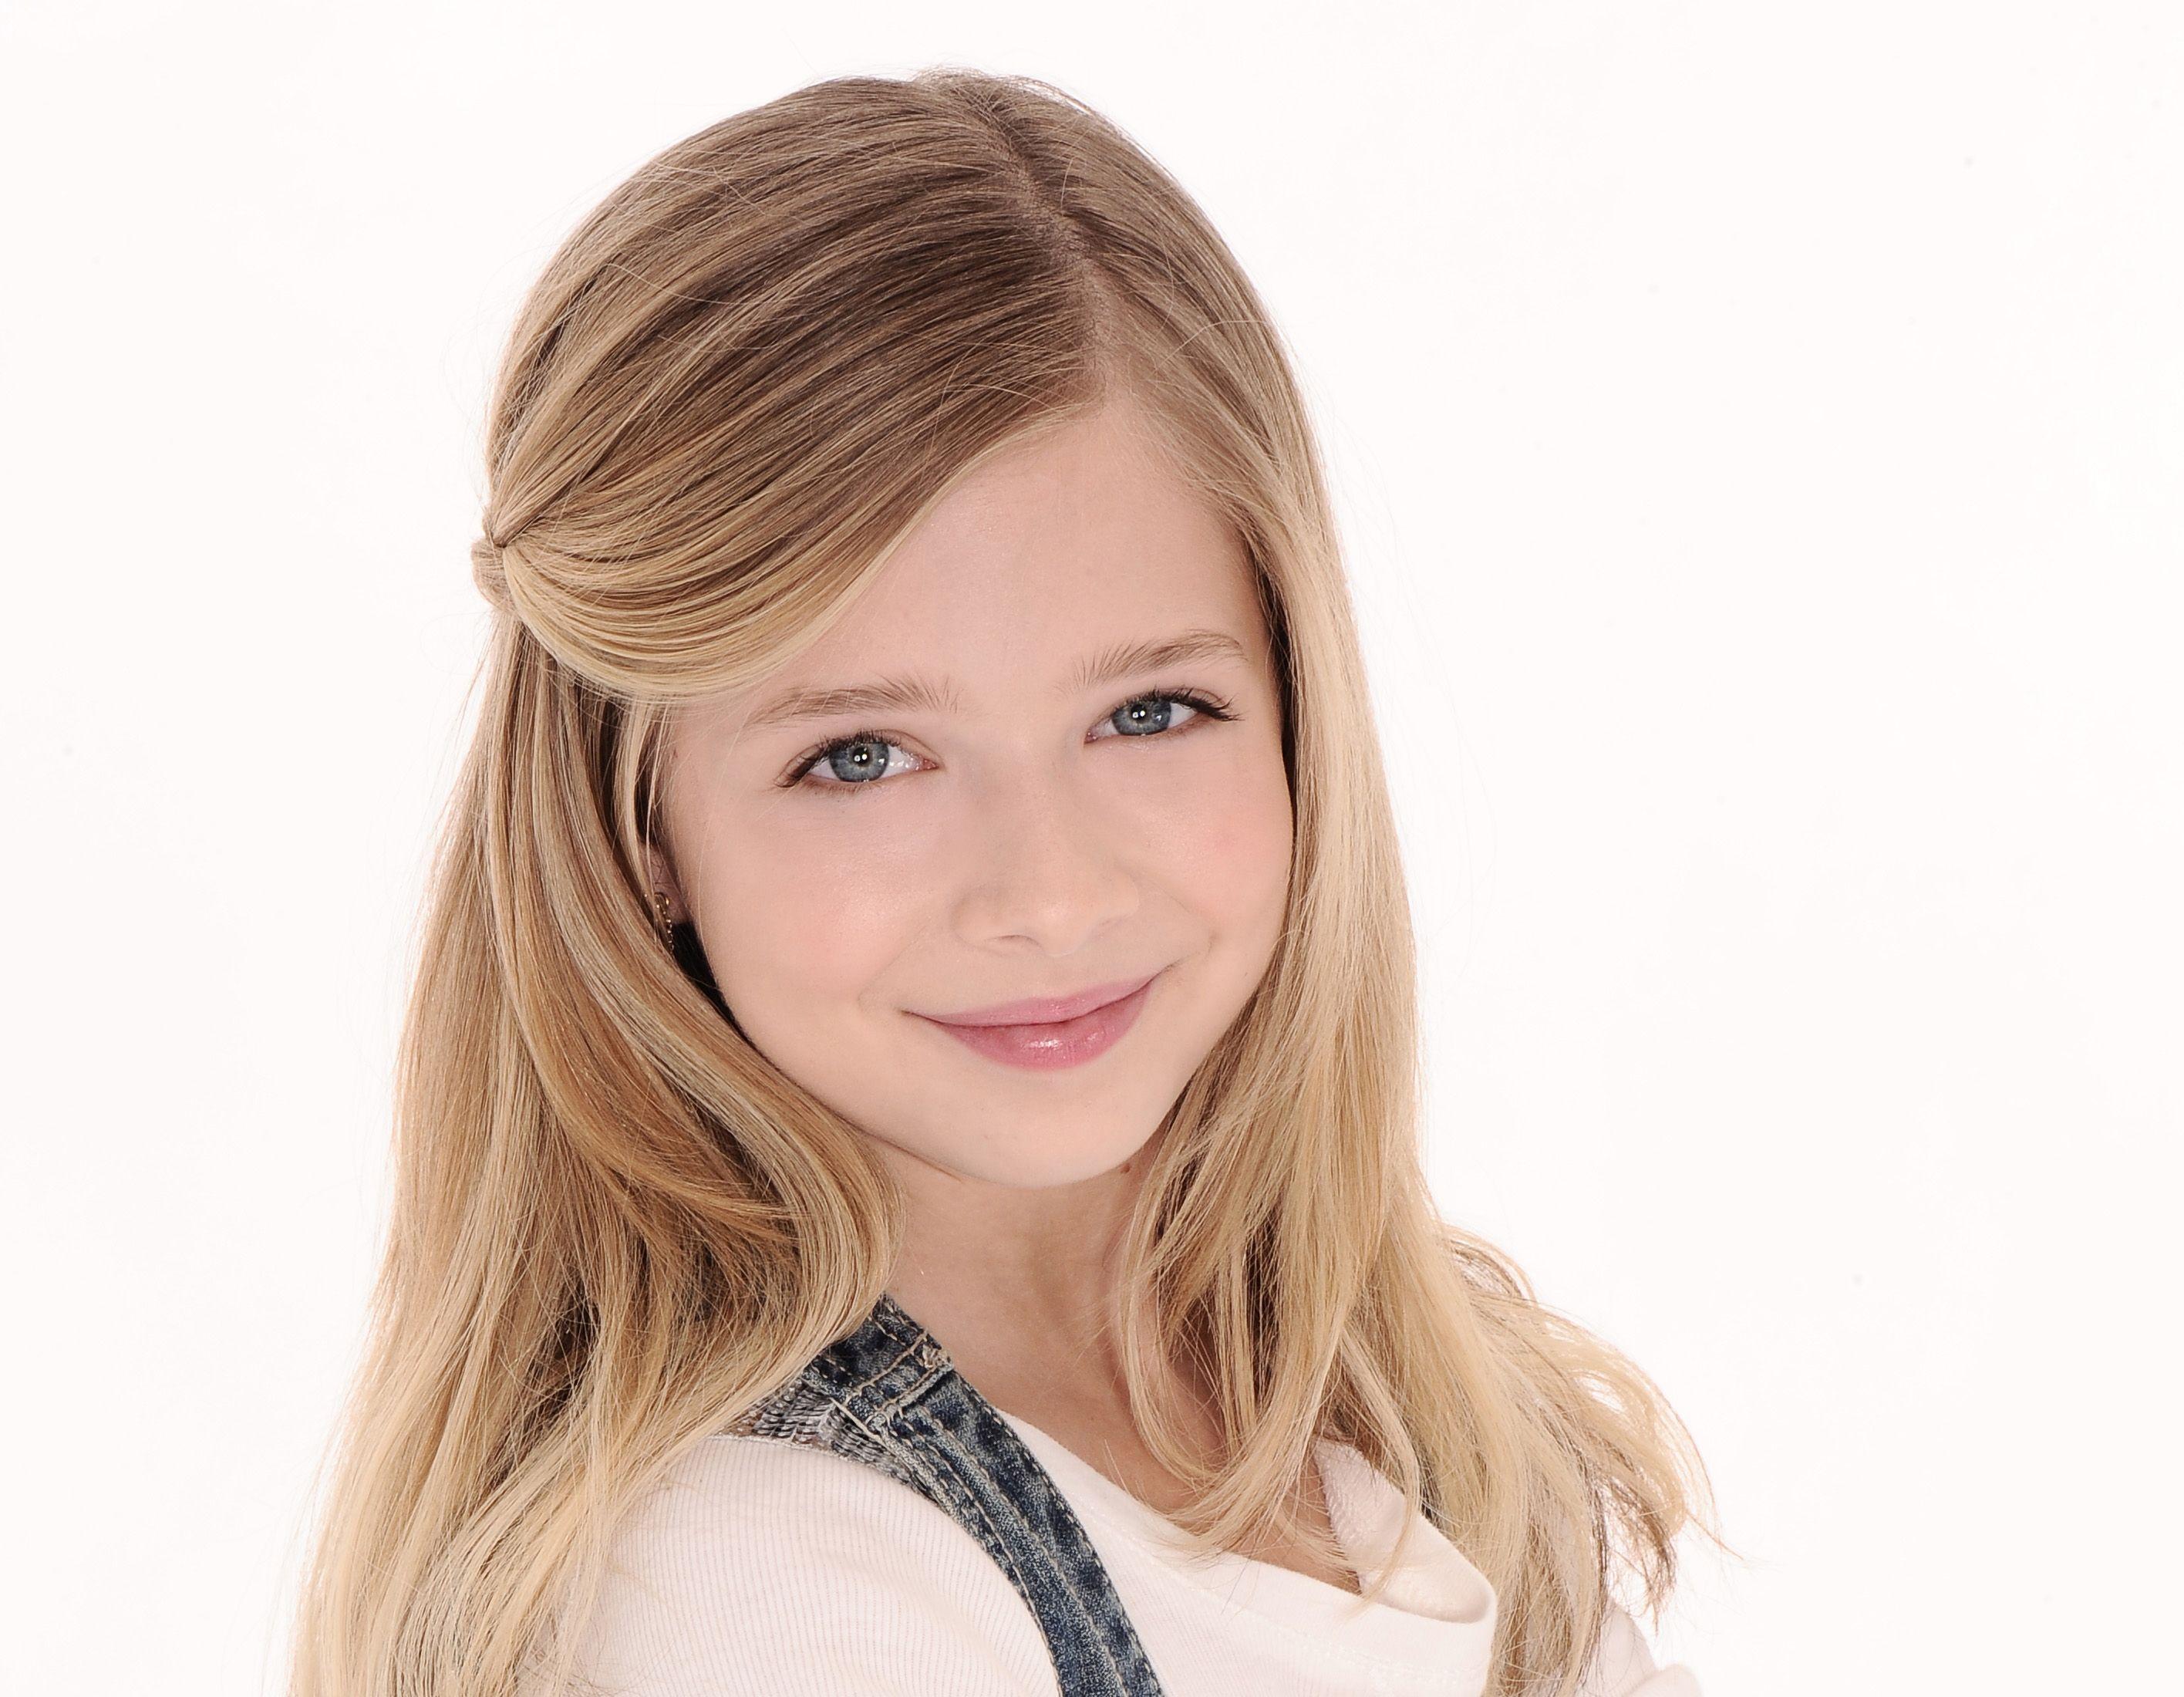 Eleven Year Old Girl Photography Google Search Gaya Rambut Rambut Artis